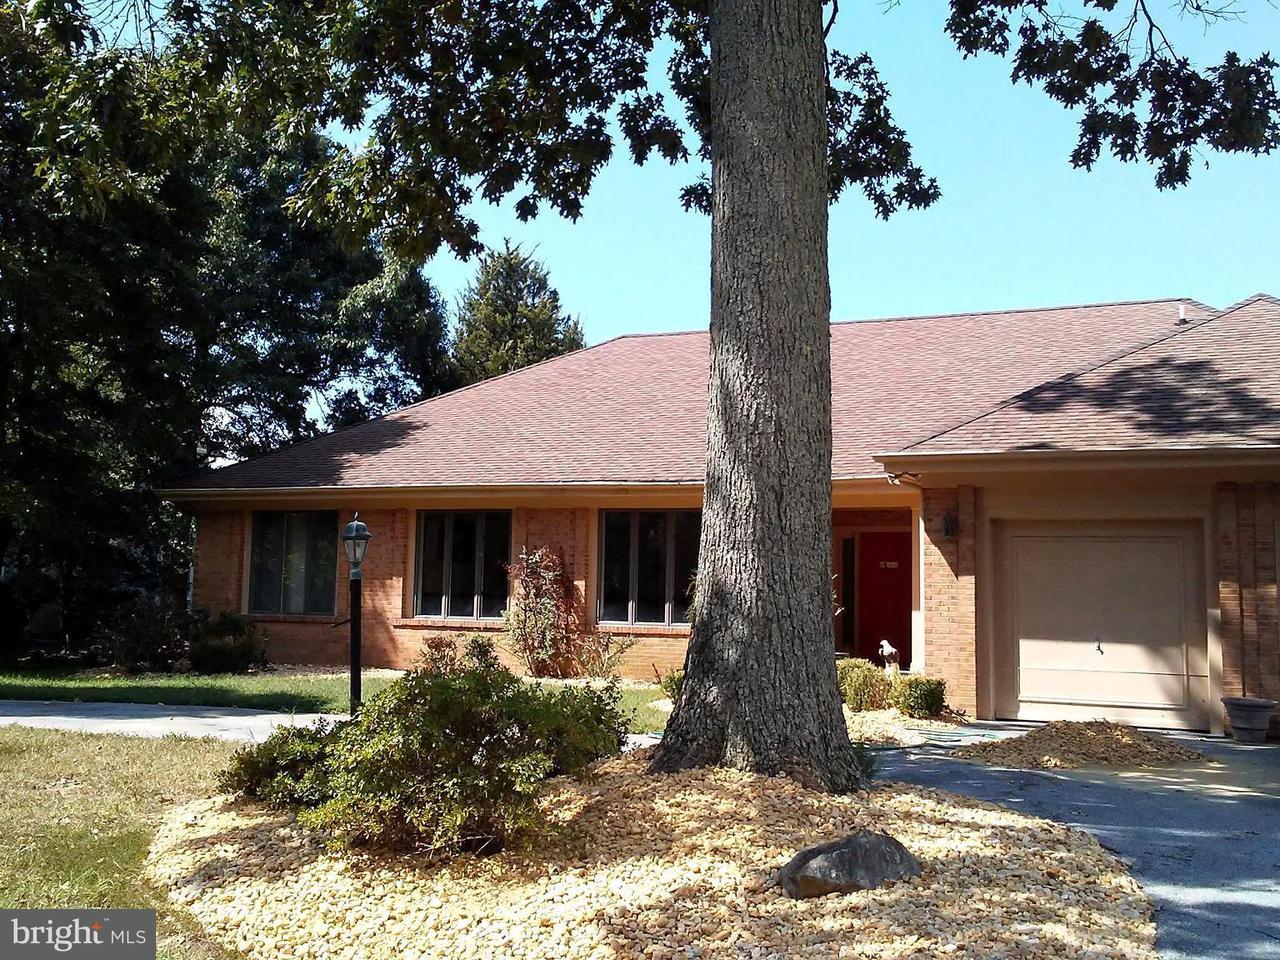 独户住宅 为 销售 在 11530 Magnolia Court 11530 Magnolia Court Swan Point, 马里兰州 20645 美国